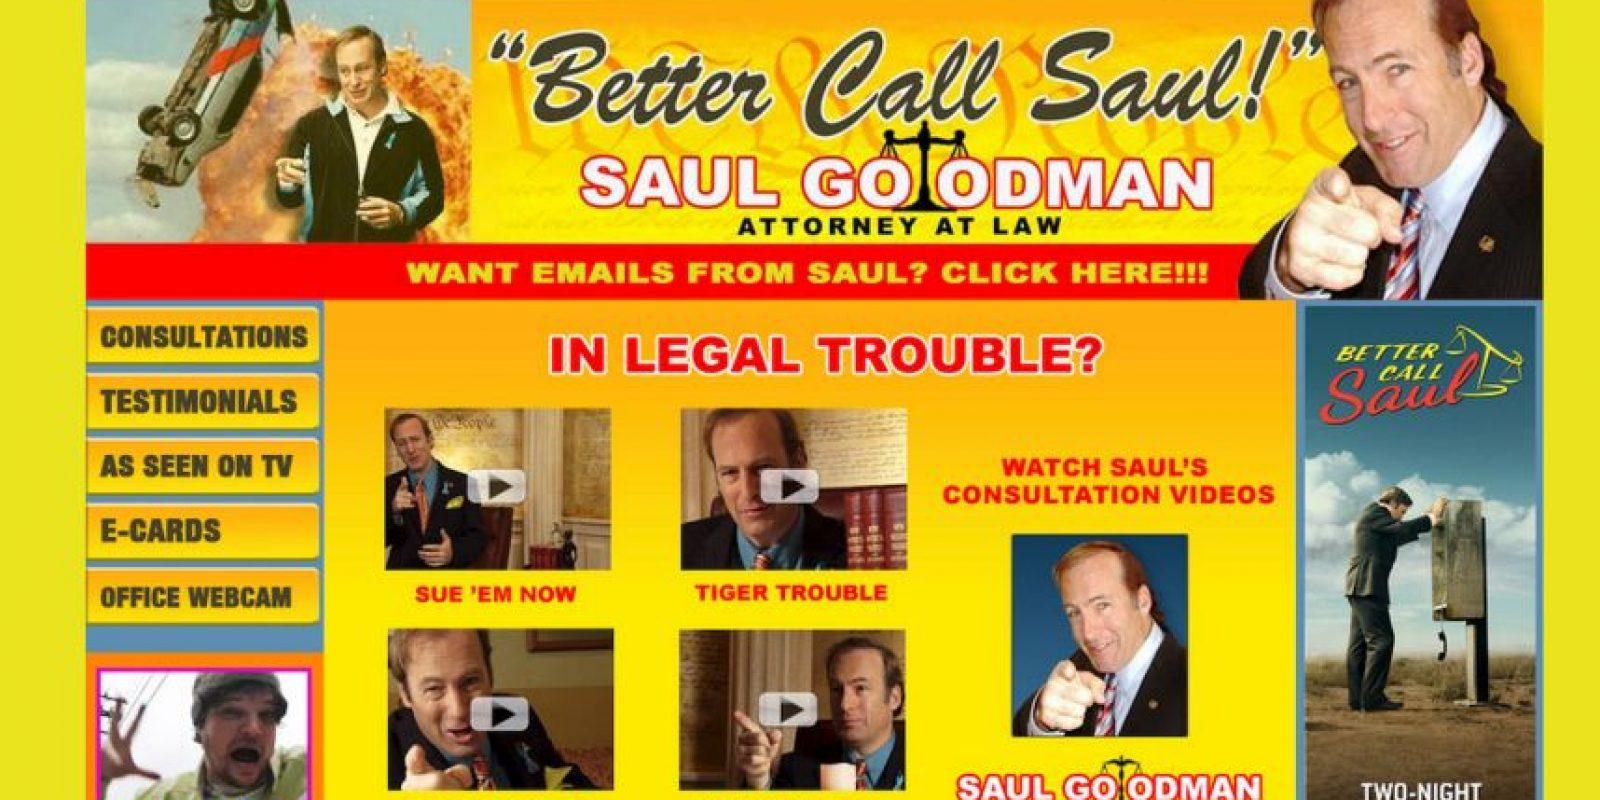 Foto:http://www.bettercallsaul.com/